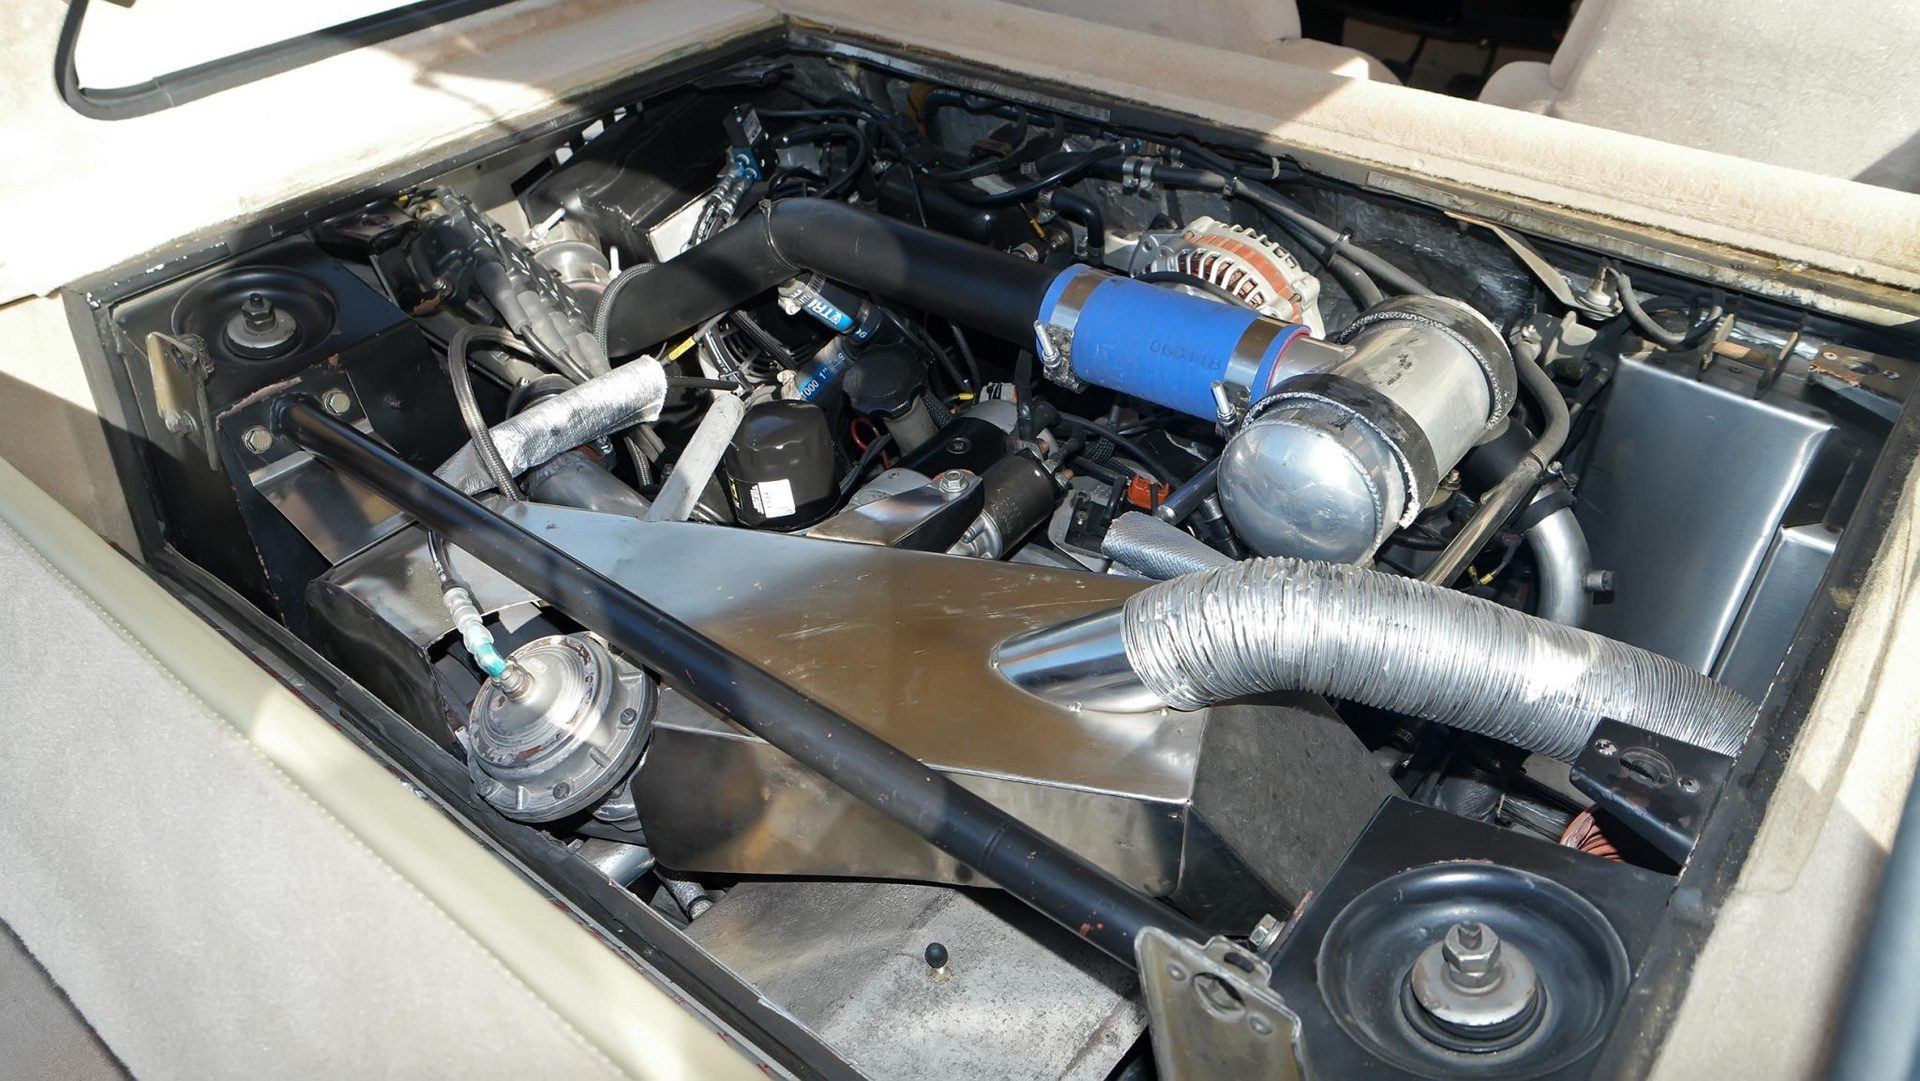 1985_Renault_R5_Turbo_2_rotary-0005